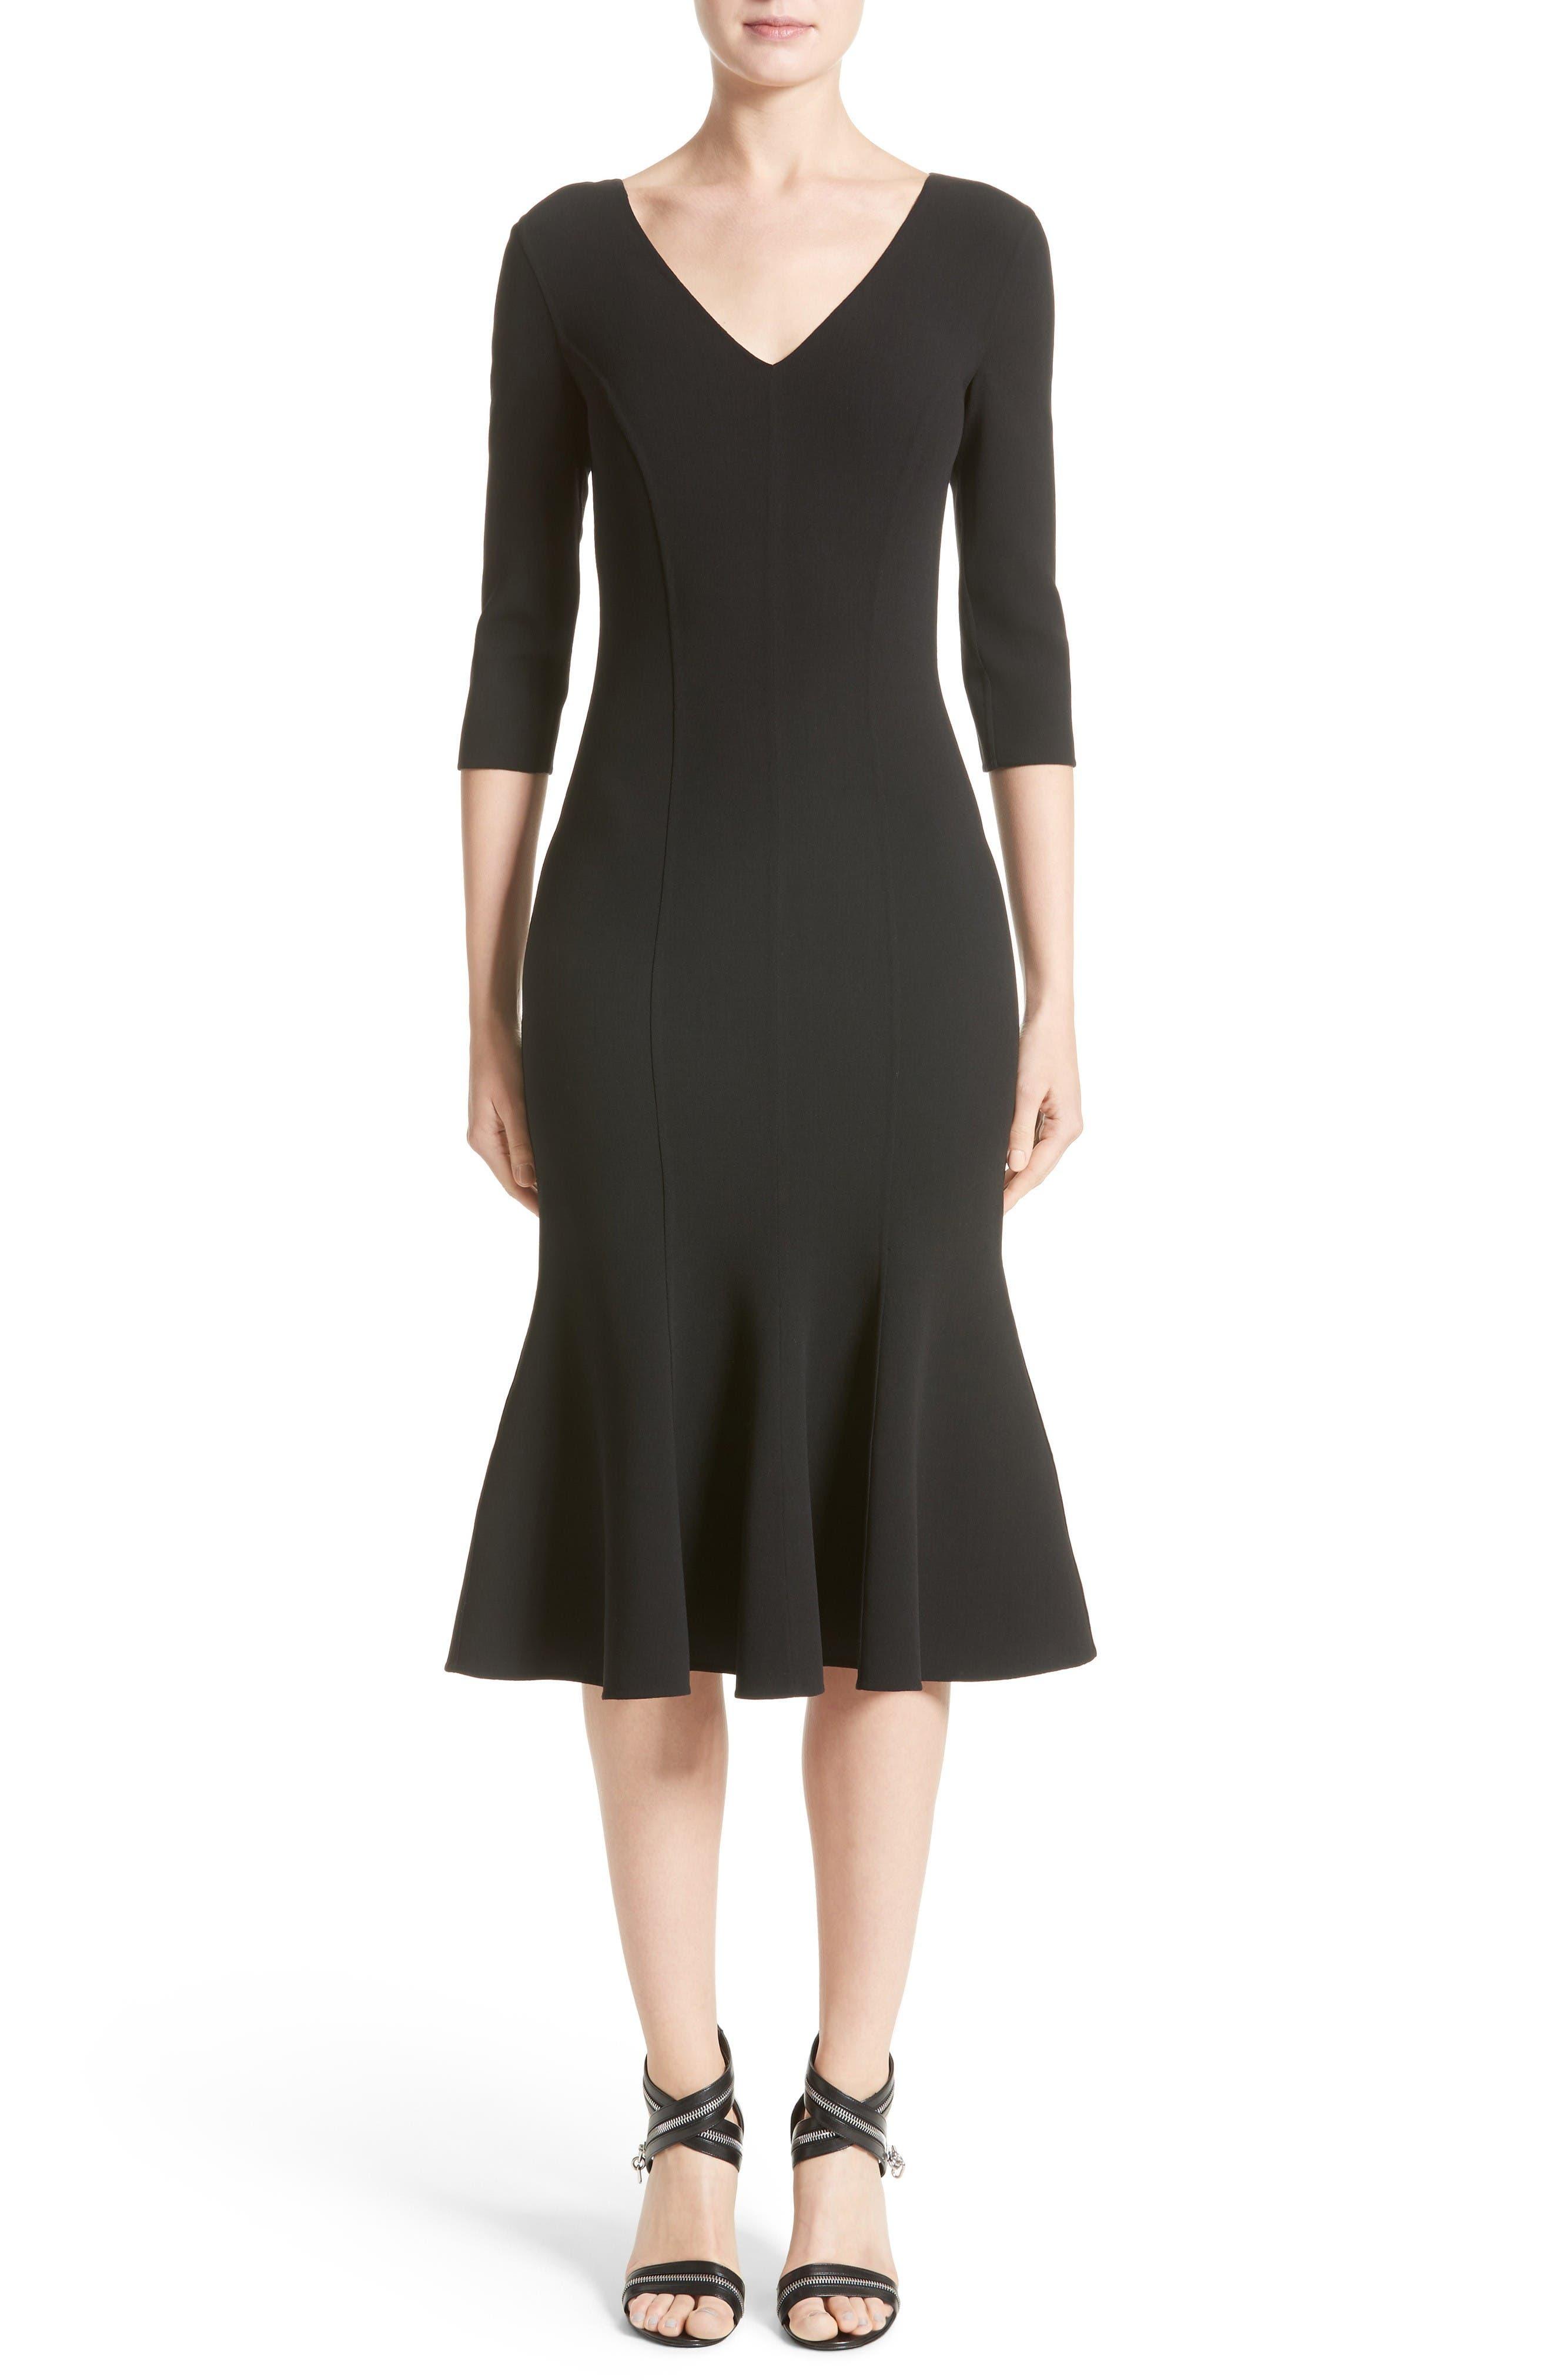 Michael Kors Stretch Wool Crepe Flounce Dress